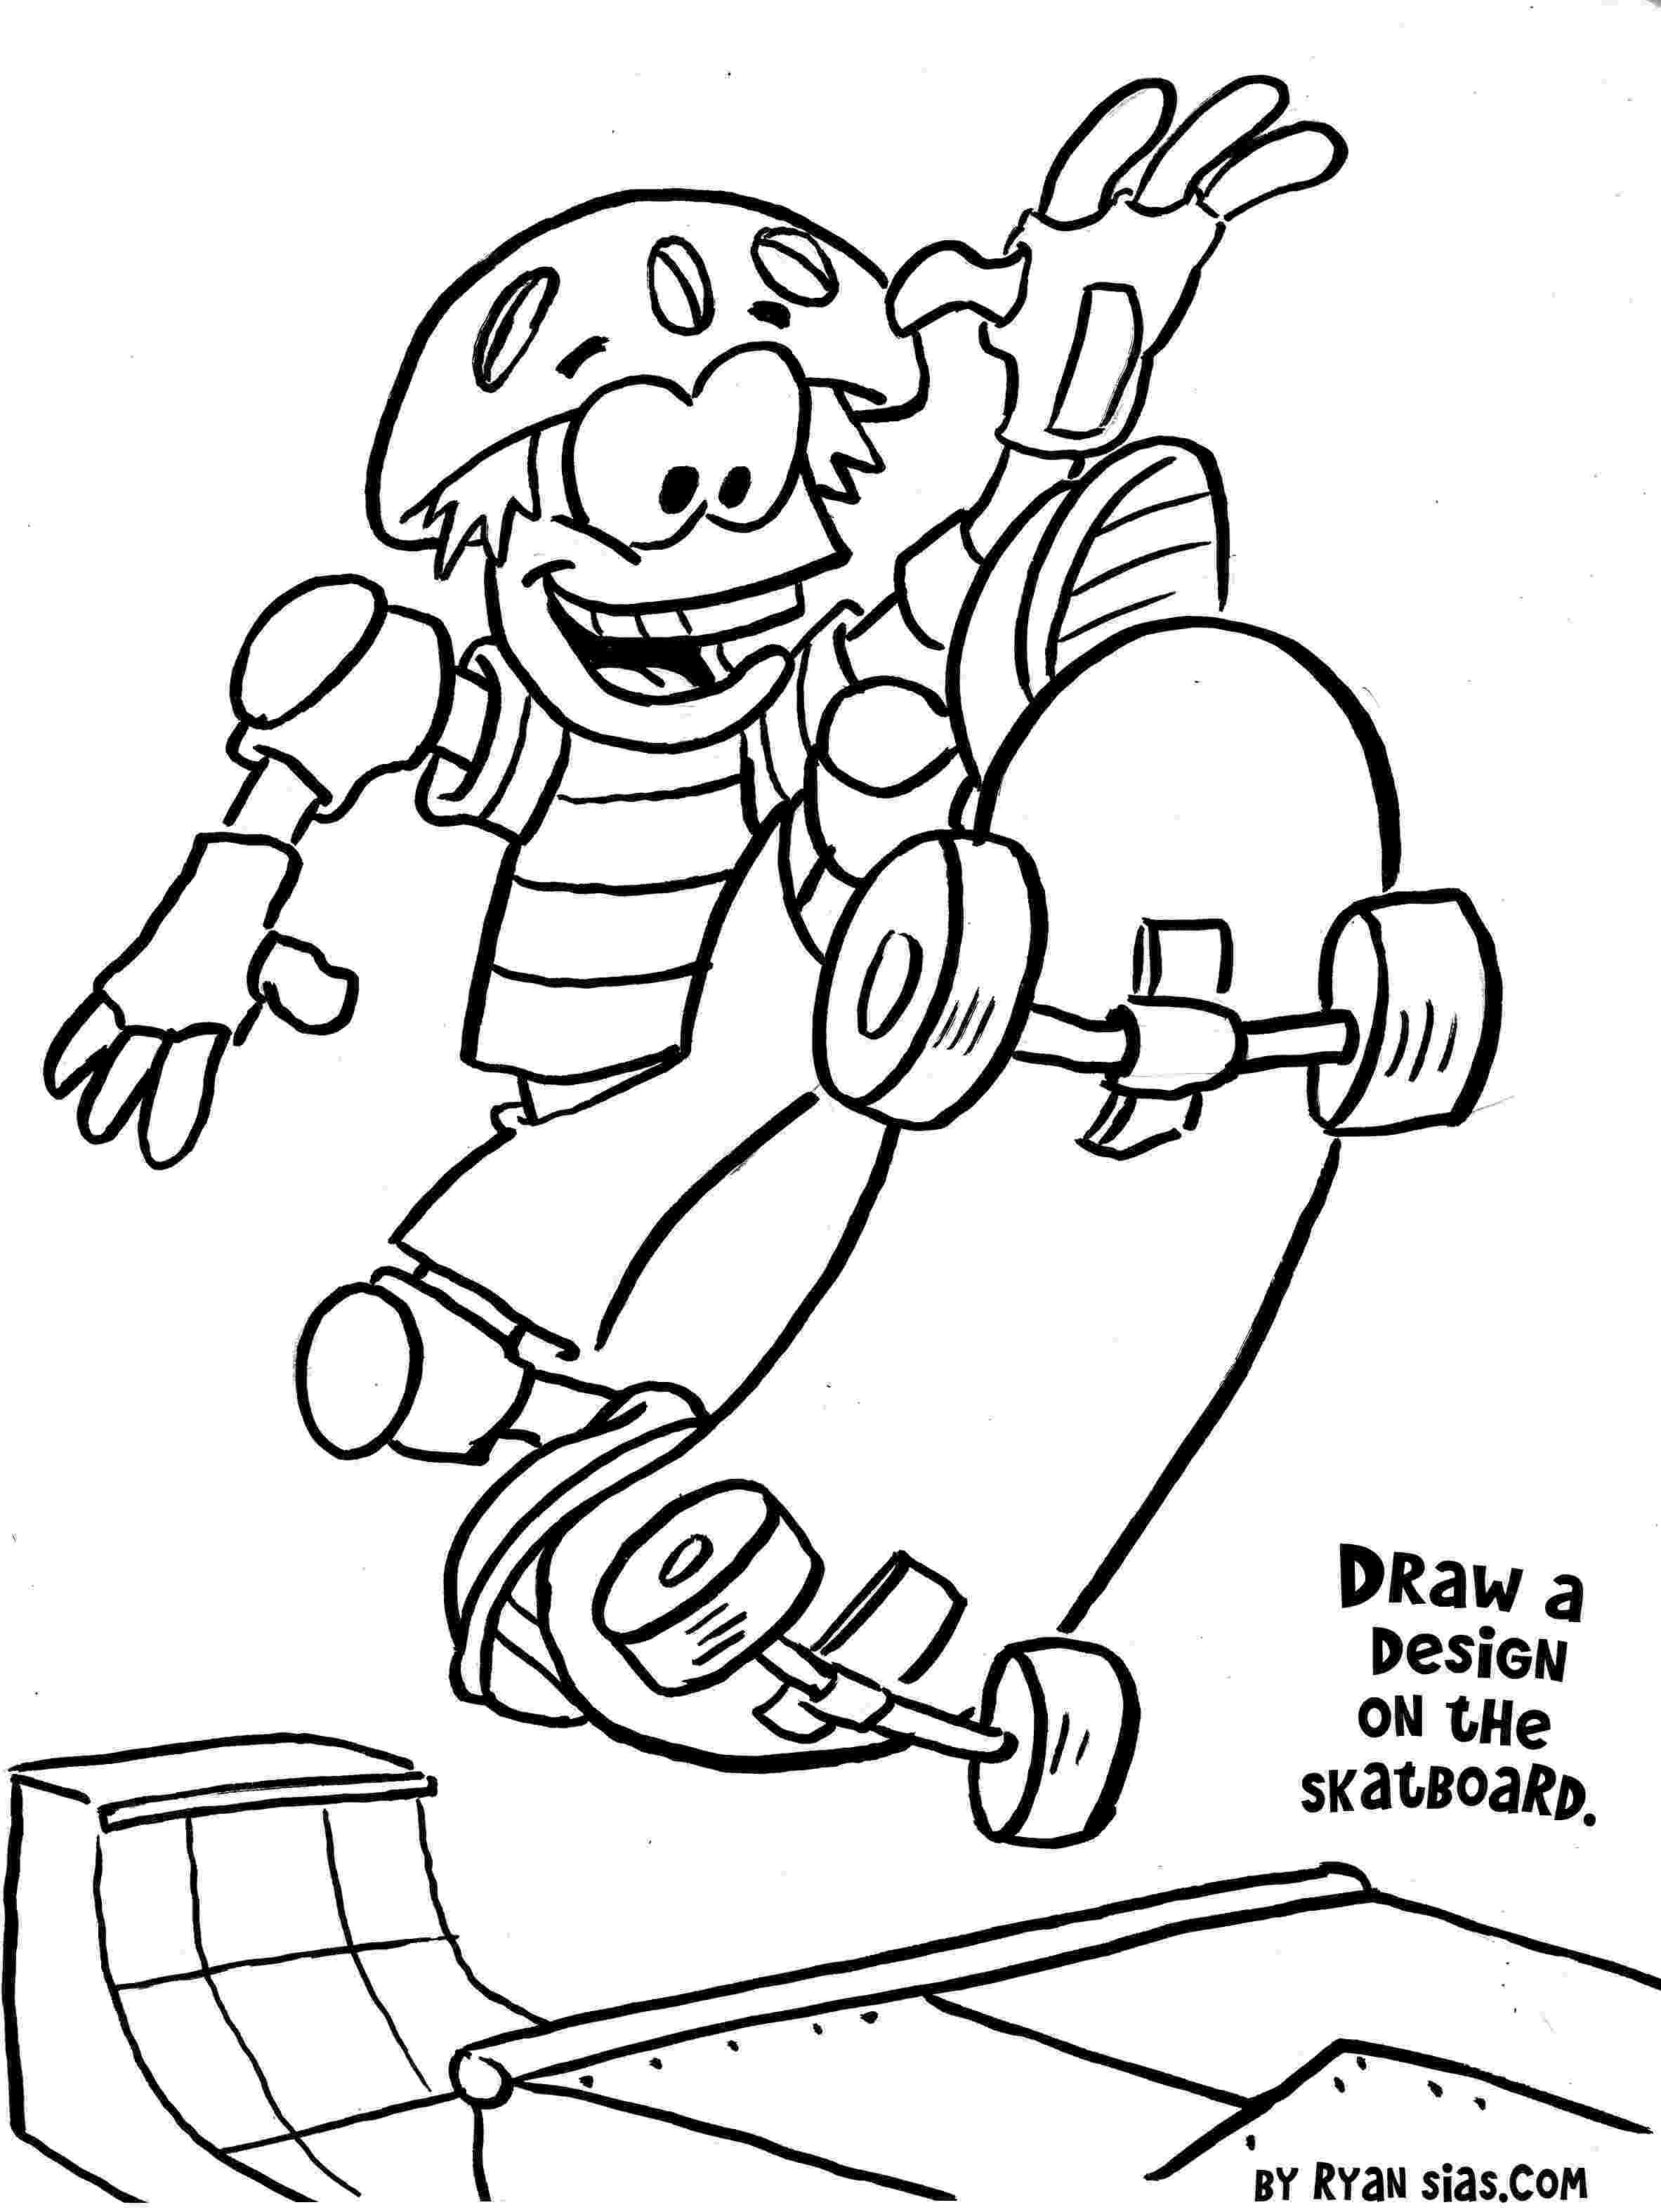 free sports coloring sheets free printable sports coloring pages skateboard sheets coloring free sports